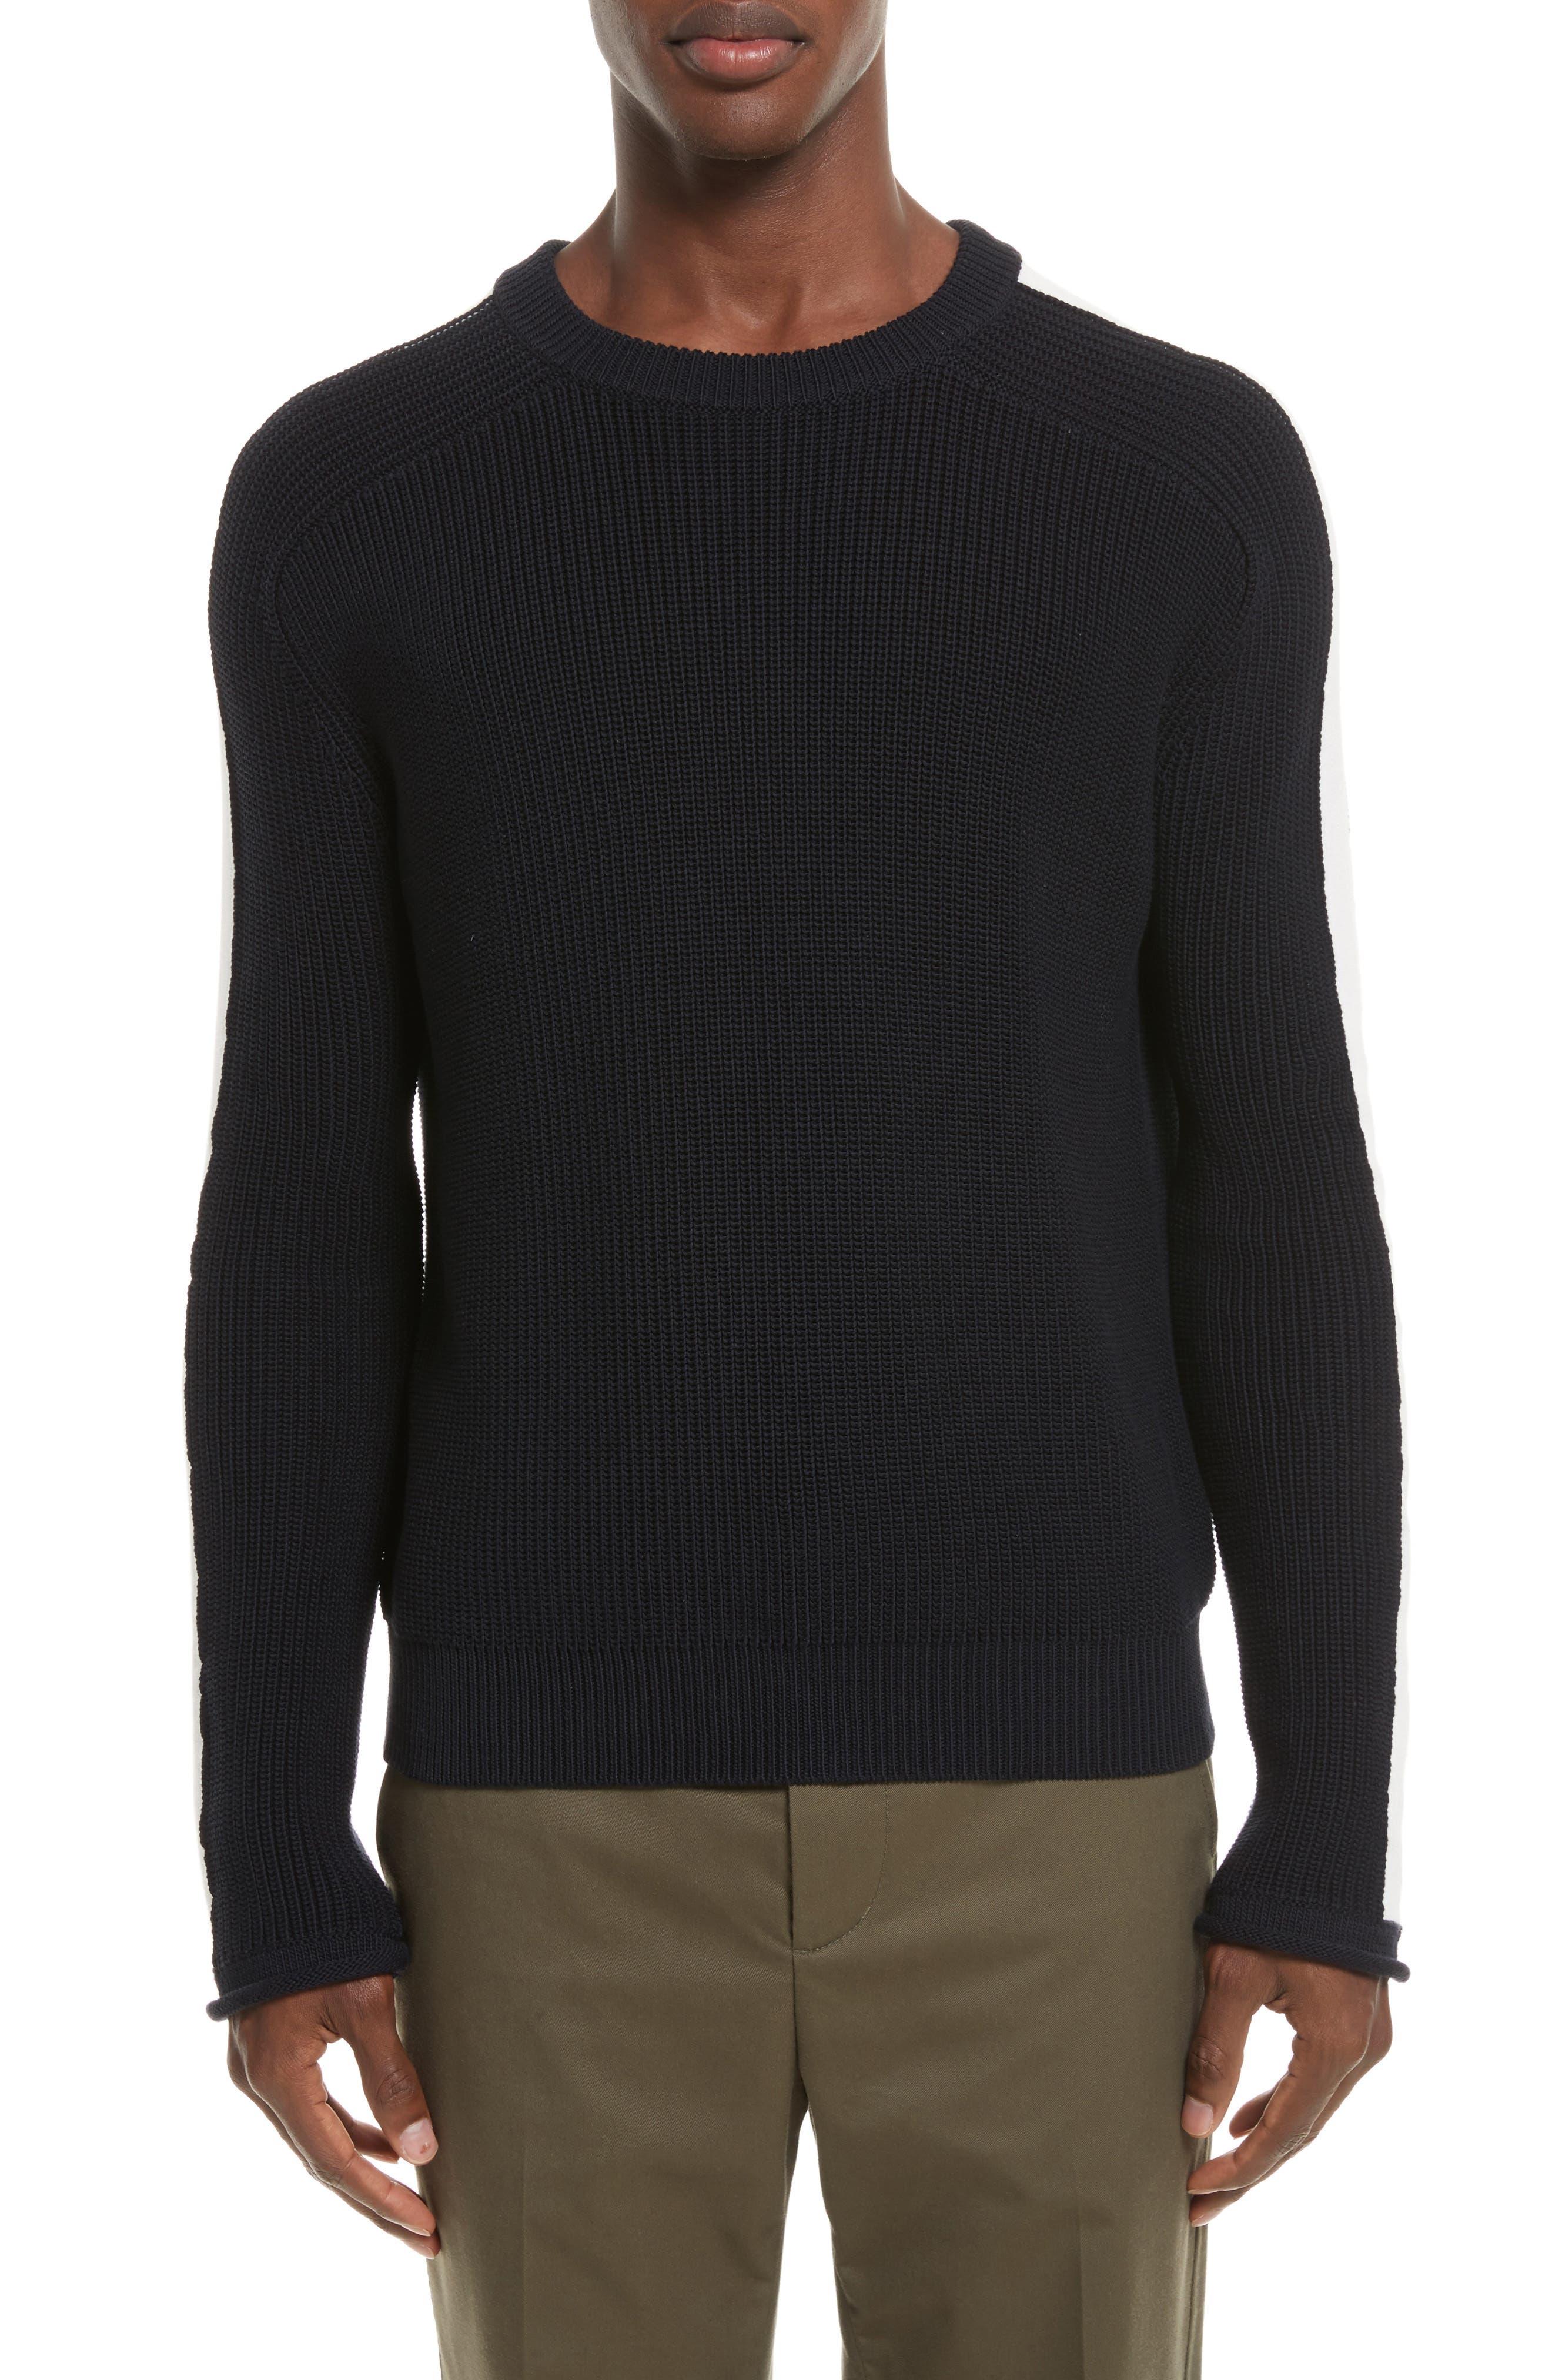 3.1 Phillip Lim Ribbed Sweater